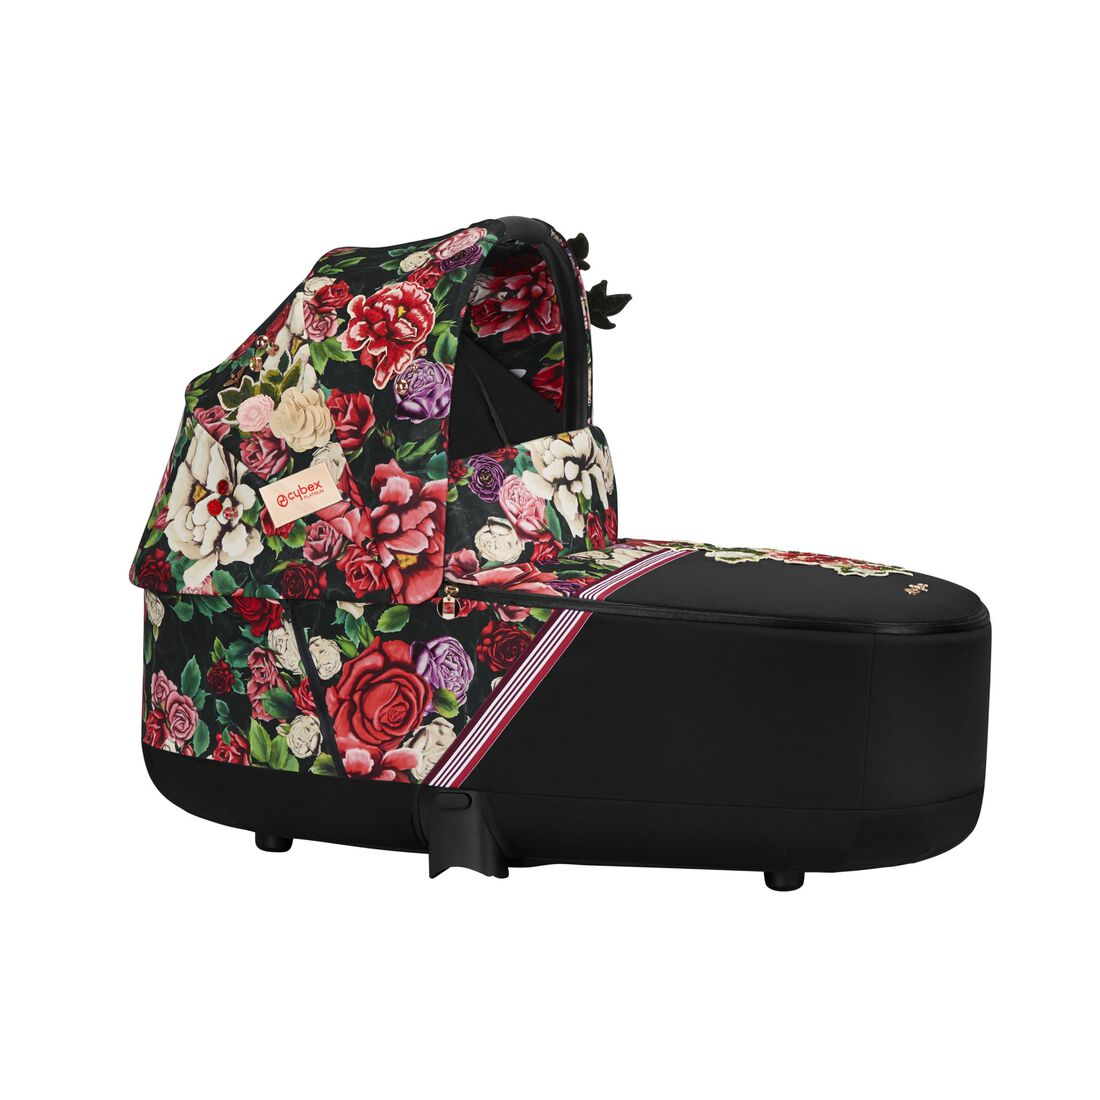 CYBEX Priam Lux Carry Cot - Spring Blossom Dark in Spring Blossom Dark large Bild 1